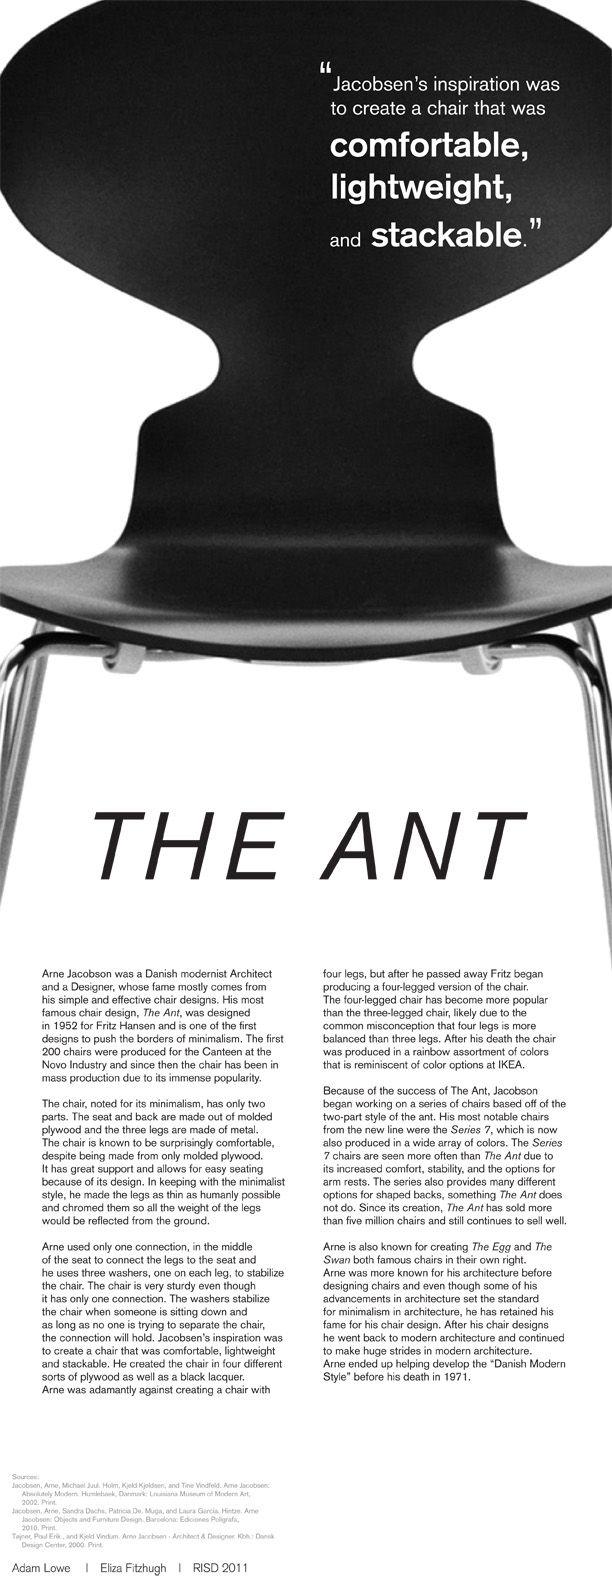 arne jacobsen 1902 71 the ant chair denmark. Black Bedroom Furniture Sets. Home Design Ideas